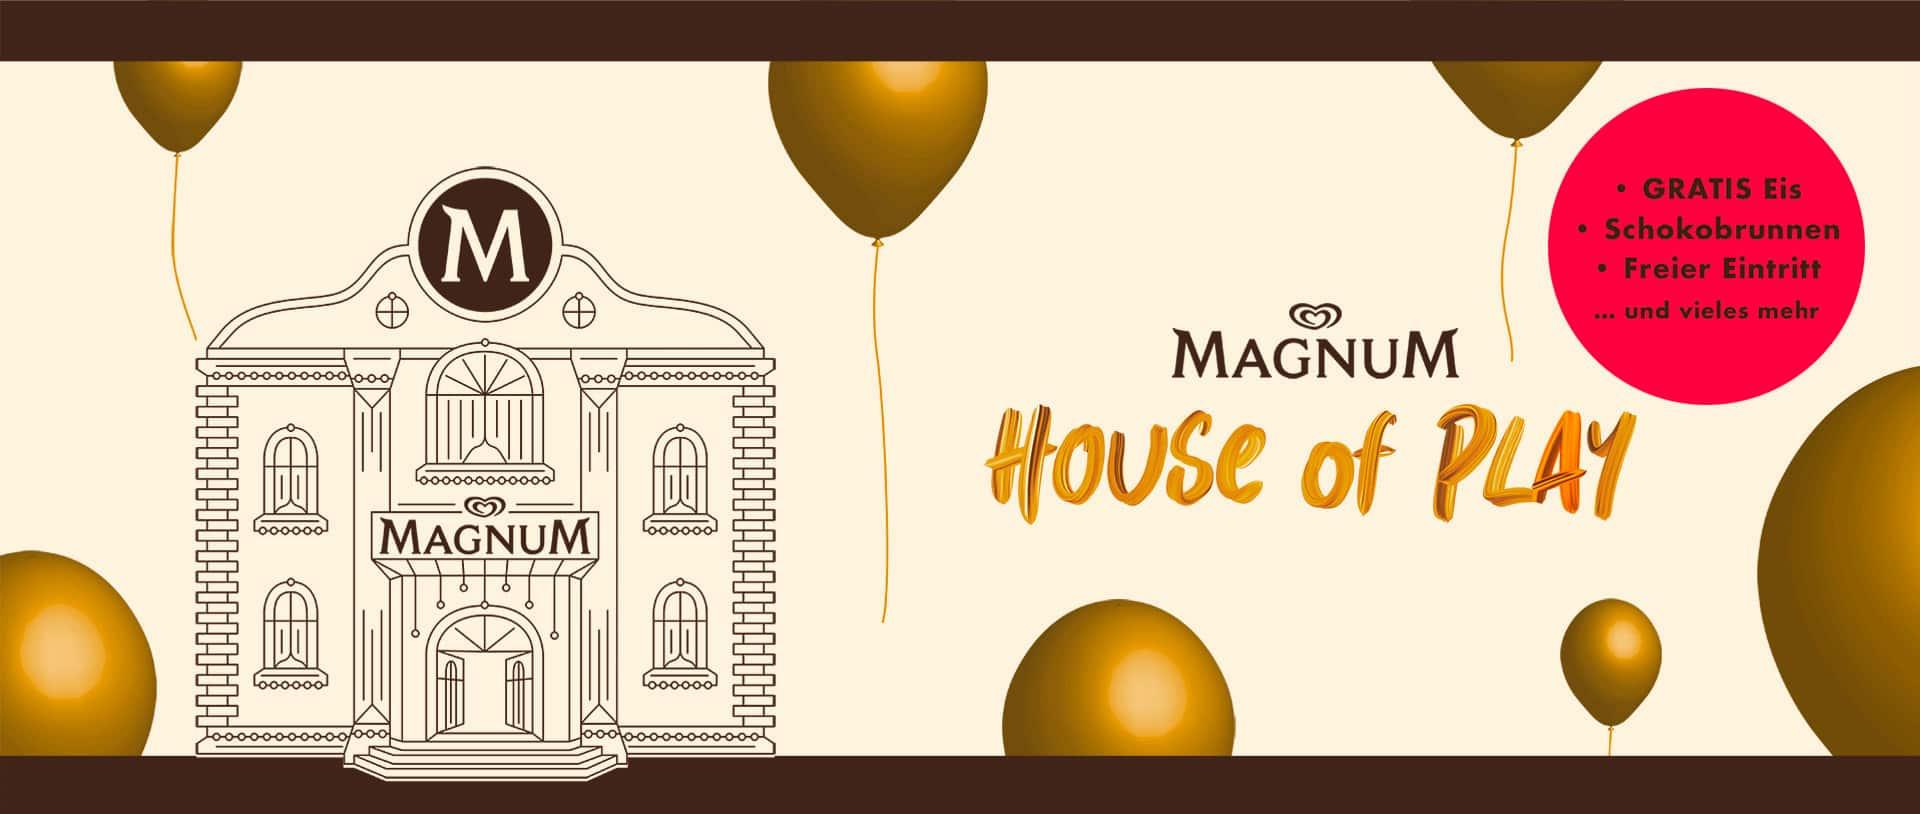 Gratis Eis im Magnum House of Play